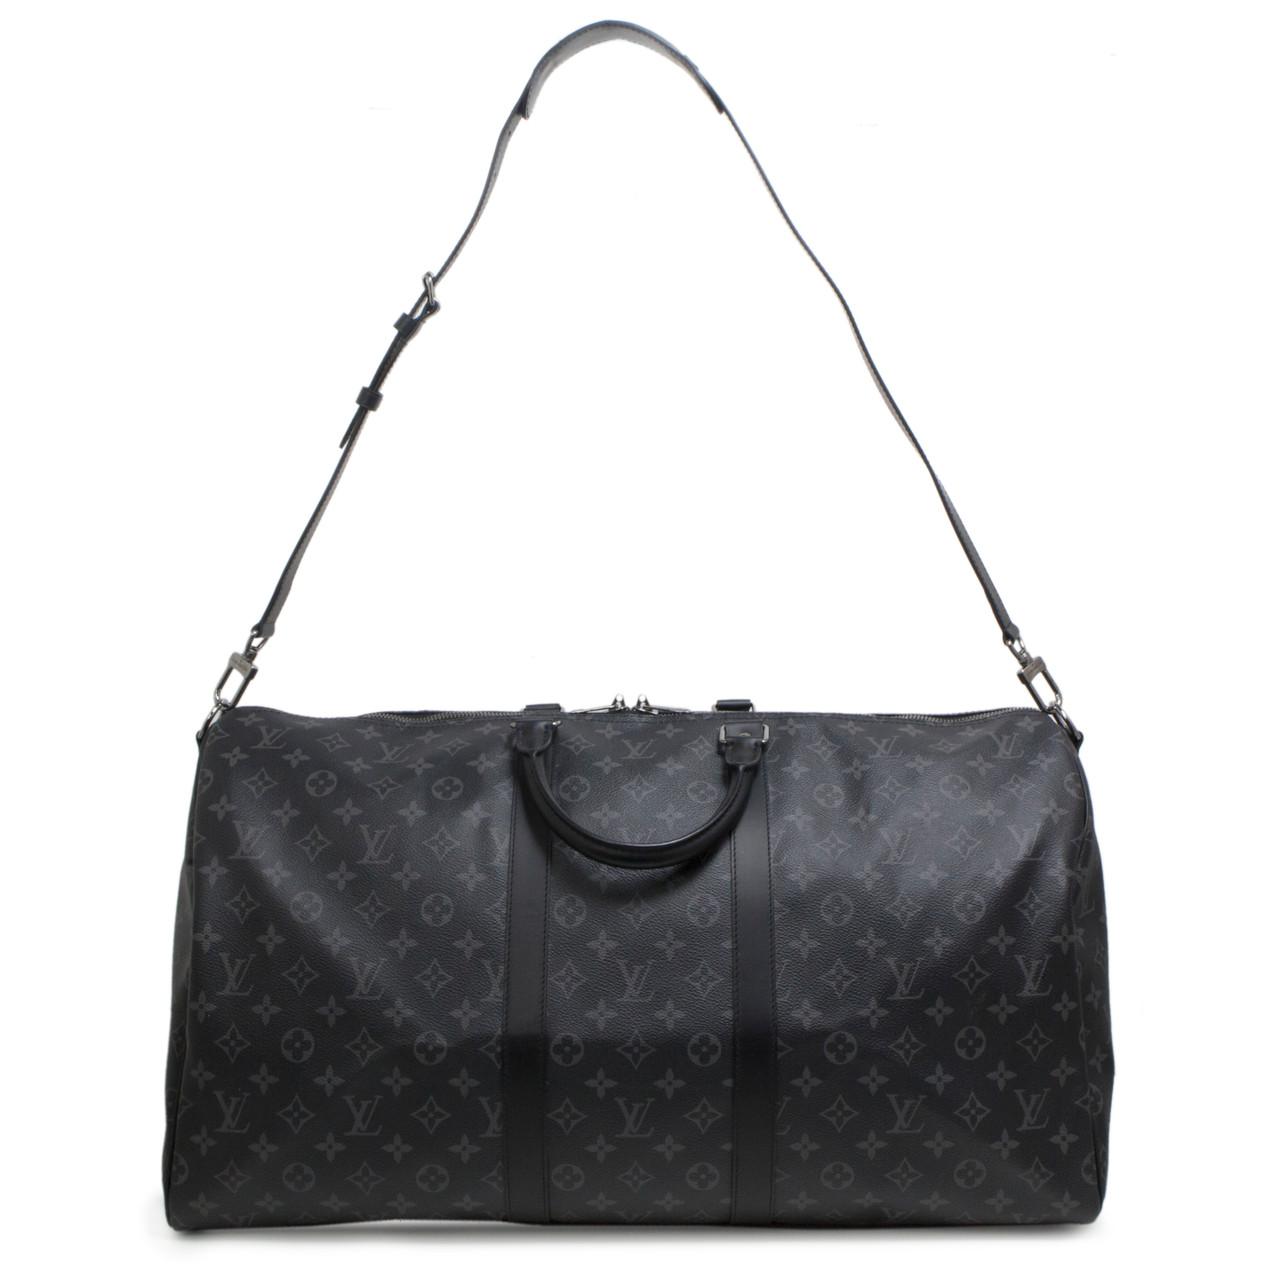 2298455959f8 Louis Vuitton Monogram Eclipse Keepall Bandouliere 55 - modaselle